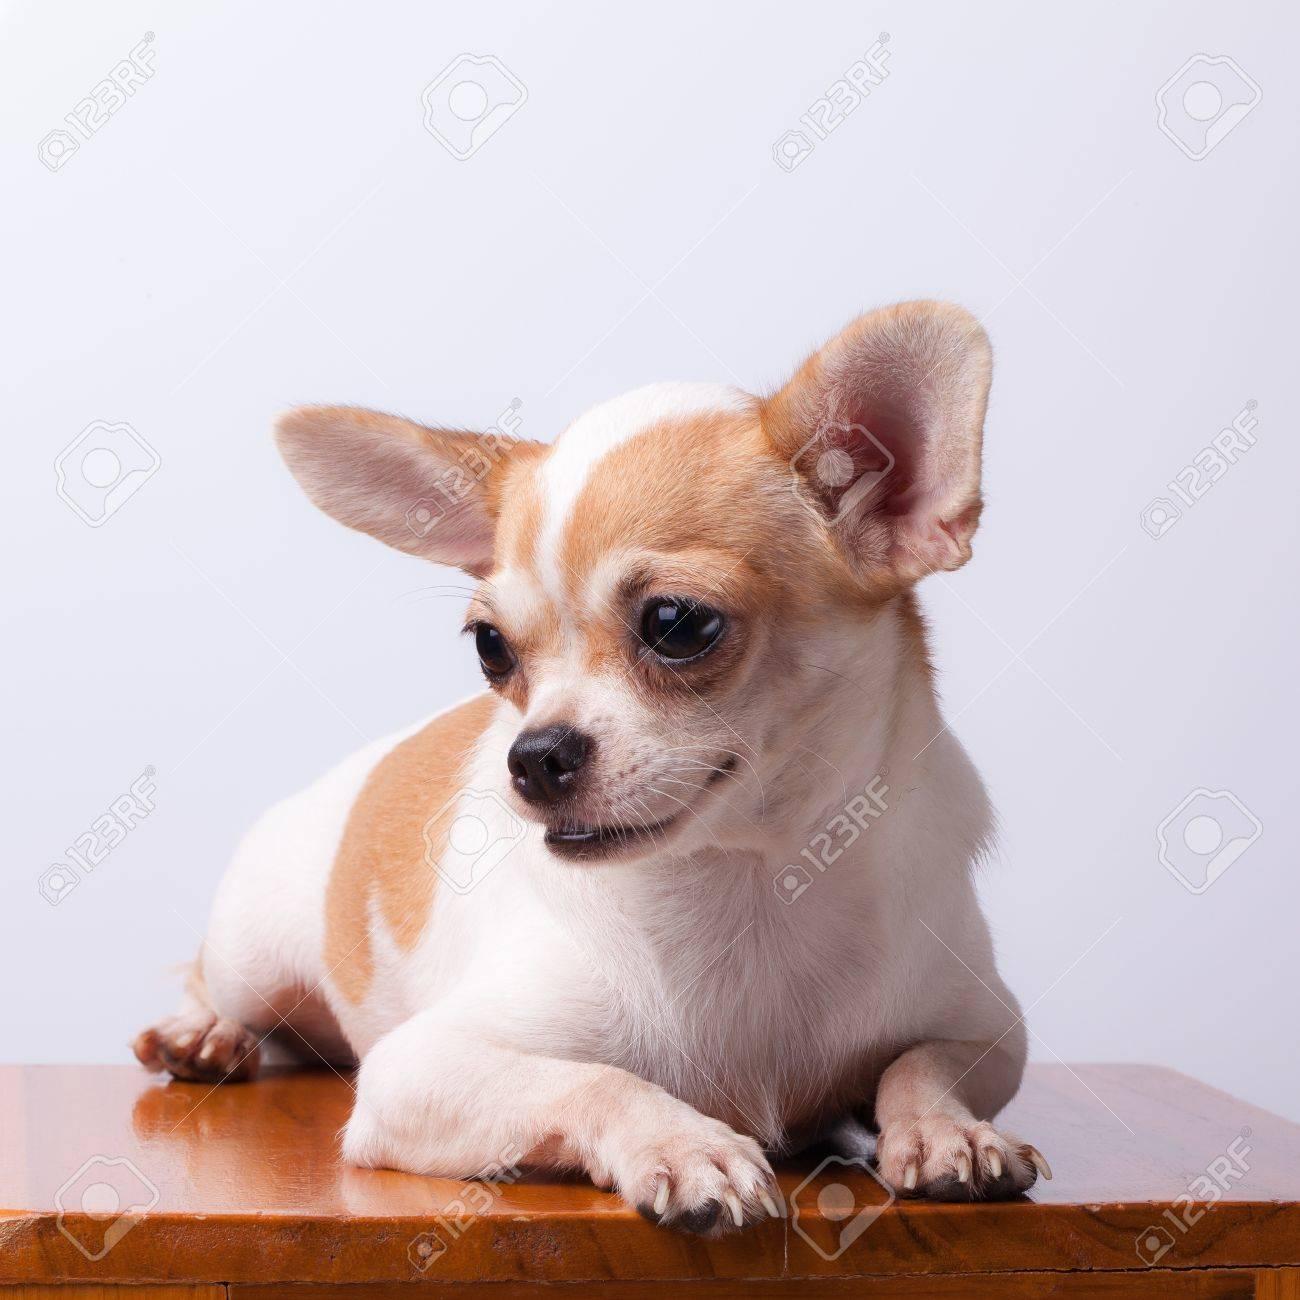 Fawn Chihuahua